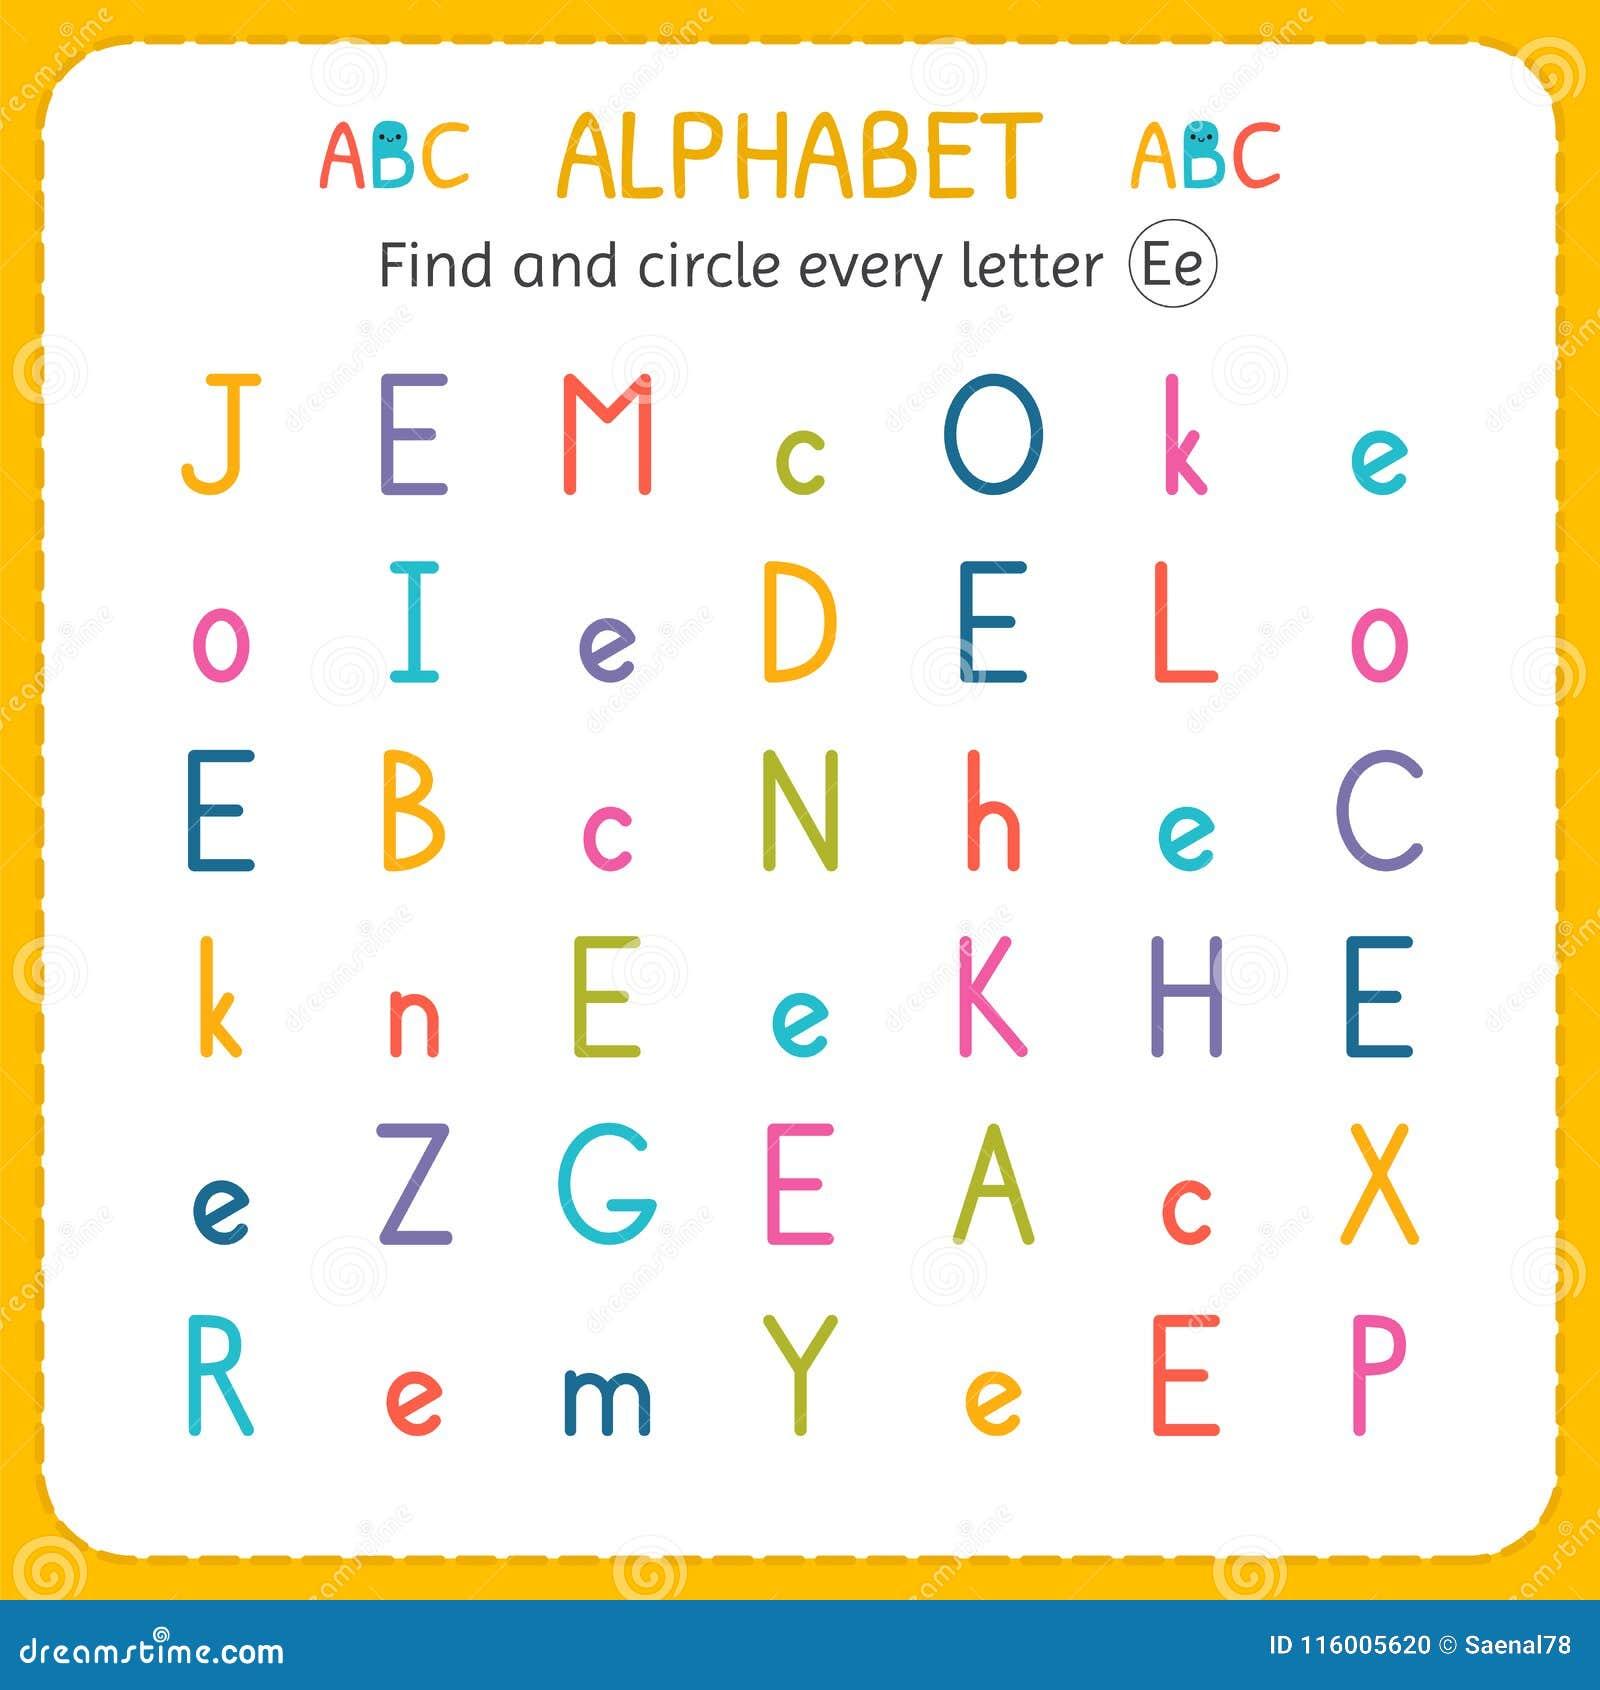 find and circle every letter e worksheet for kindergarten and preschool exercises for children. Black Bedroom Furniture Sets. Home Design Ideas